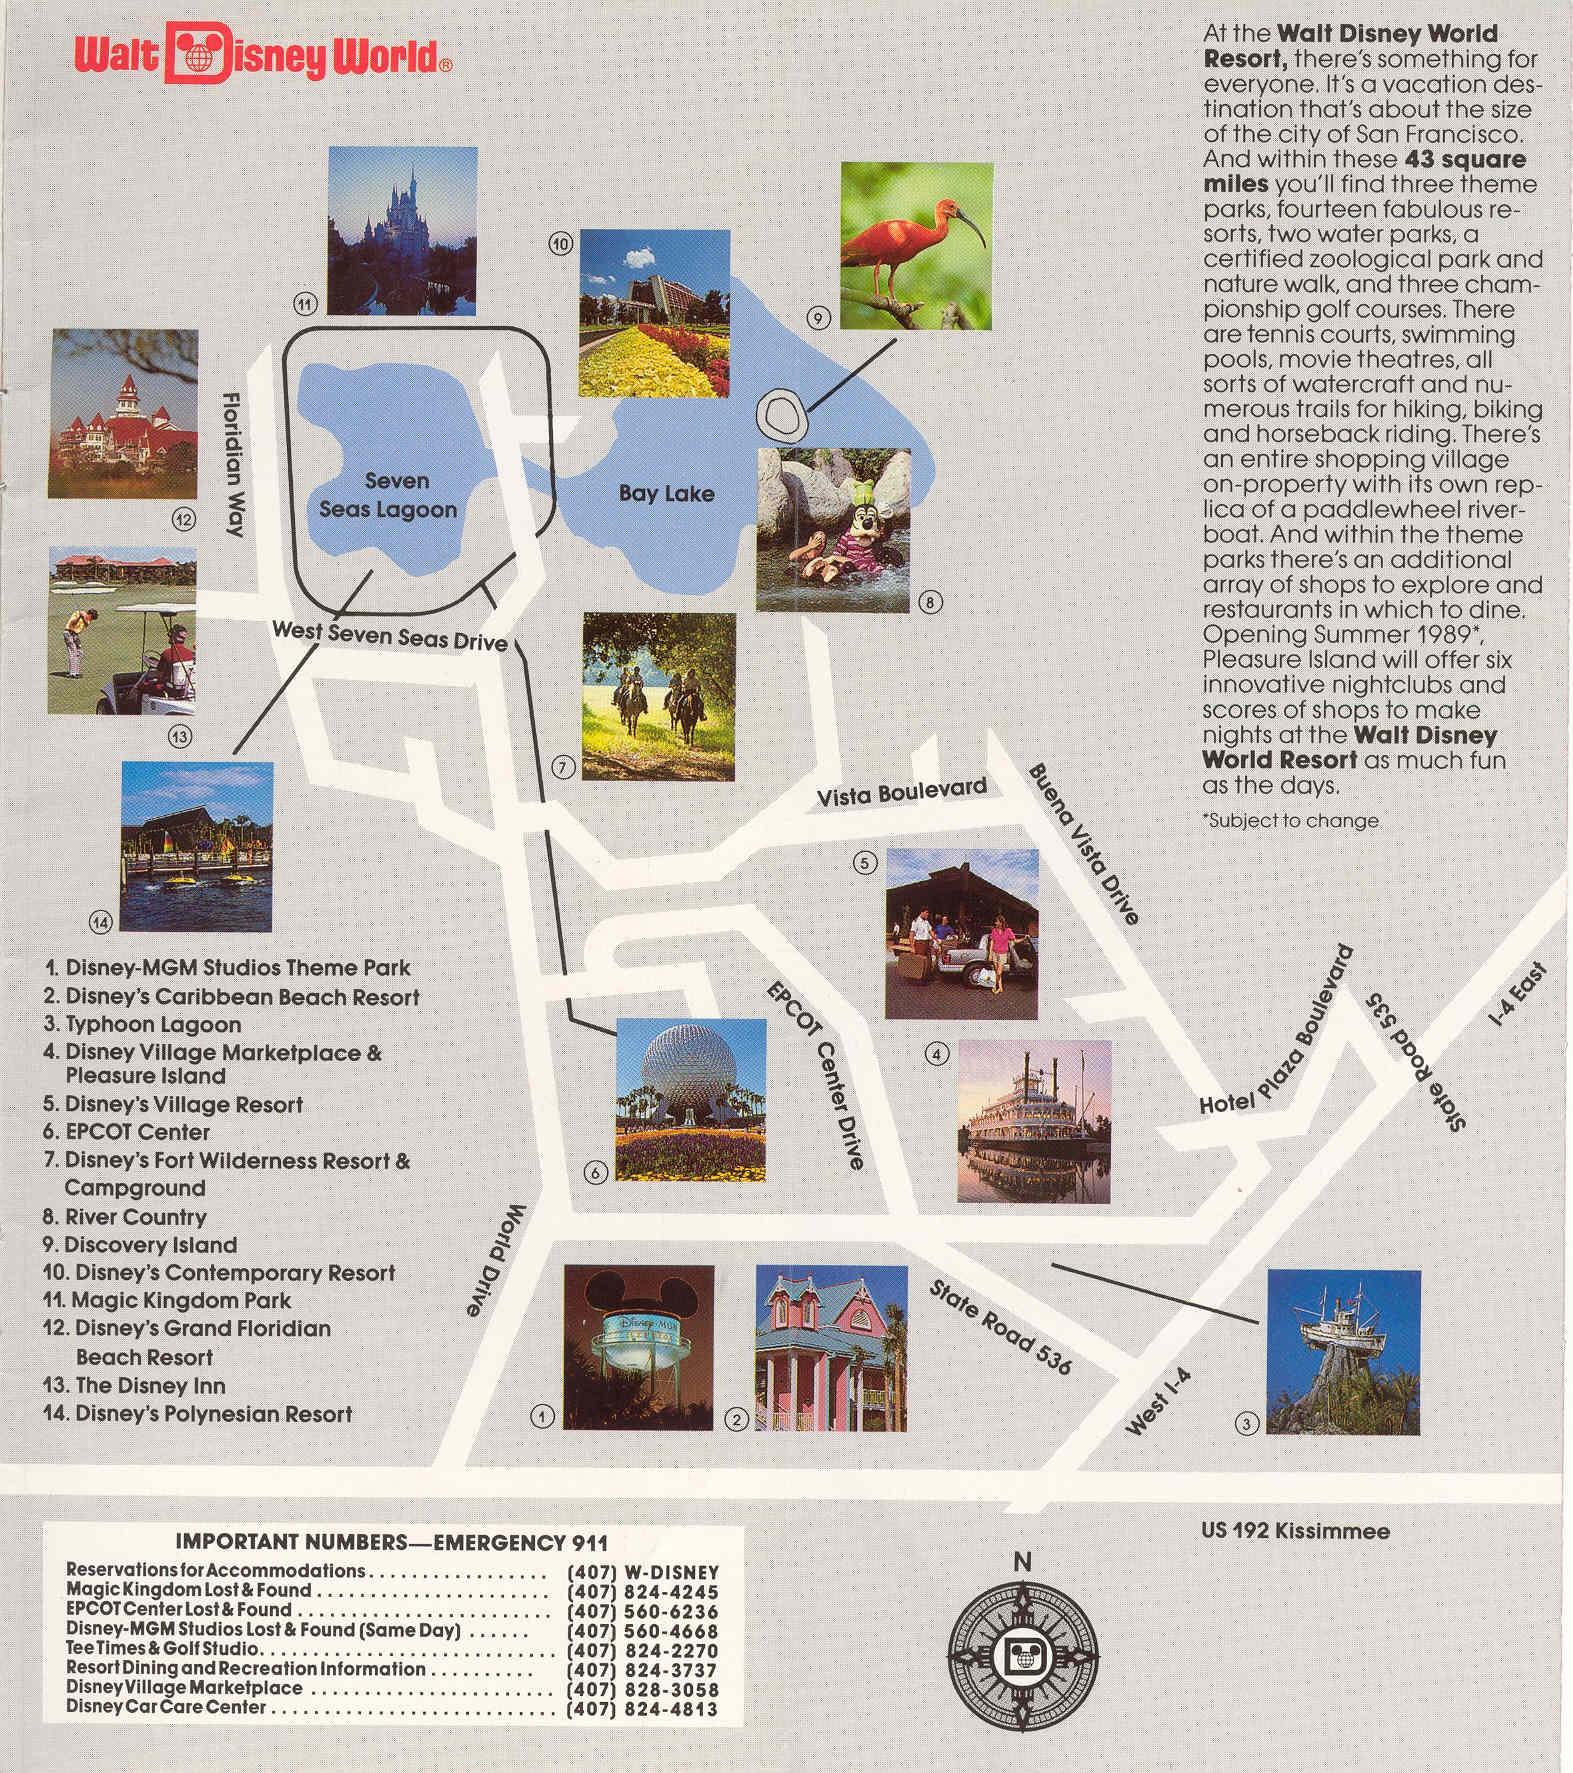 DisneyMGM Studios Guide Book Photo Of - Walt disney world river country map